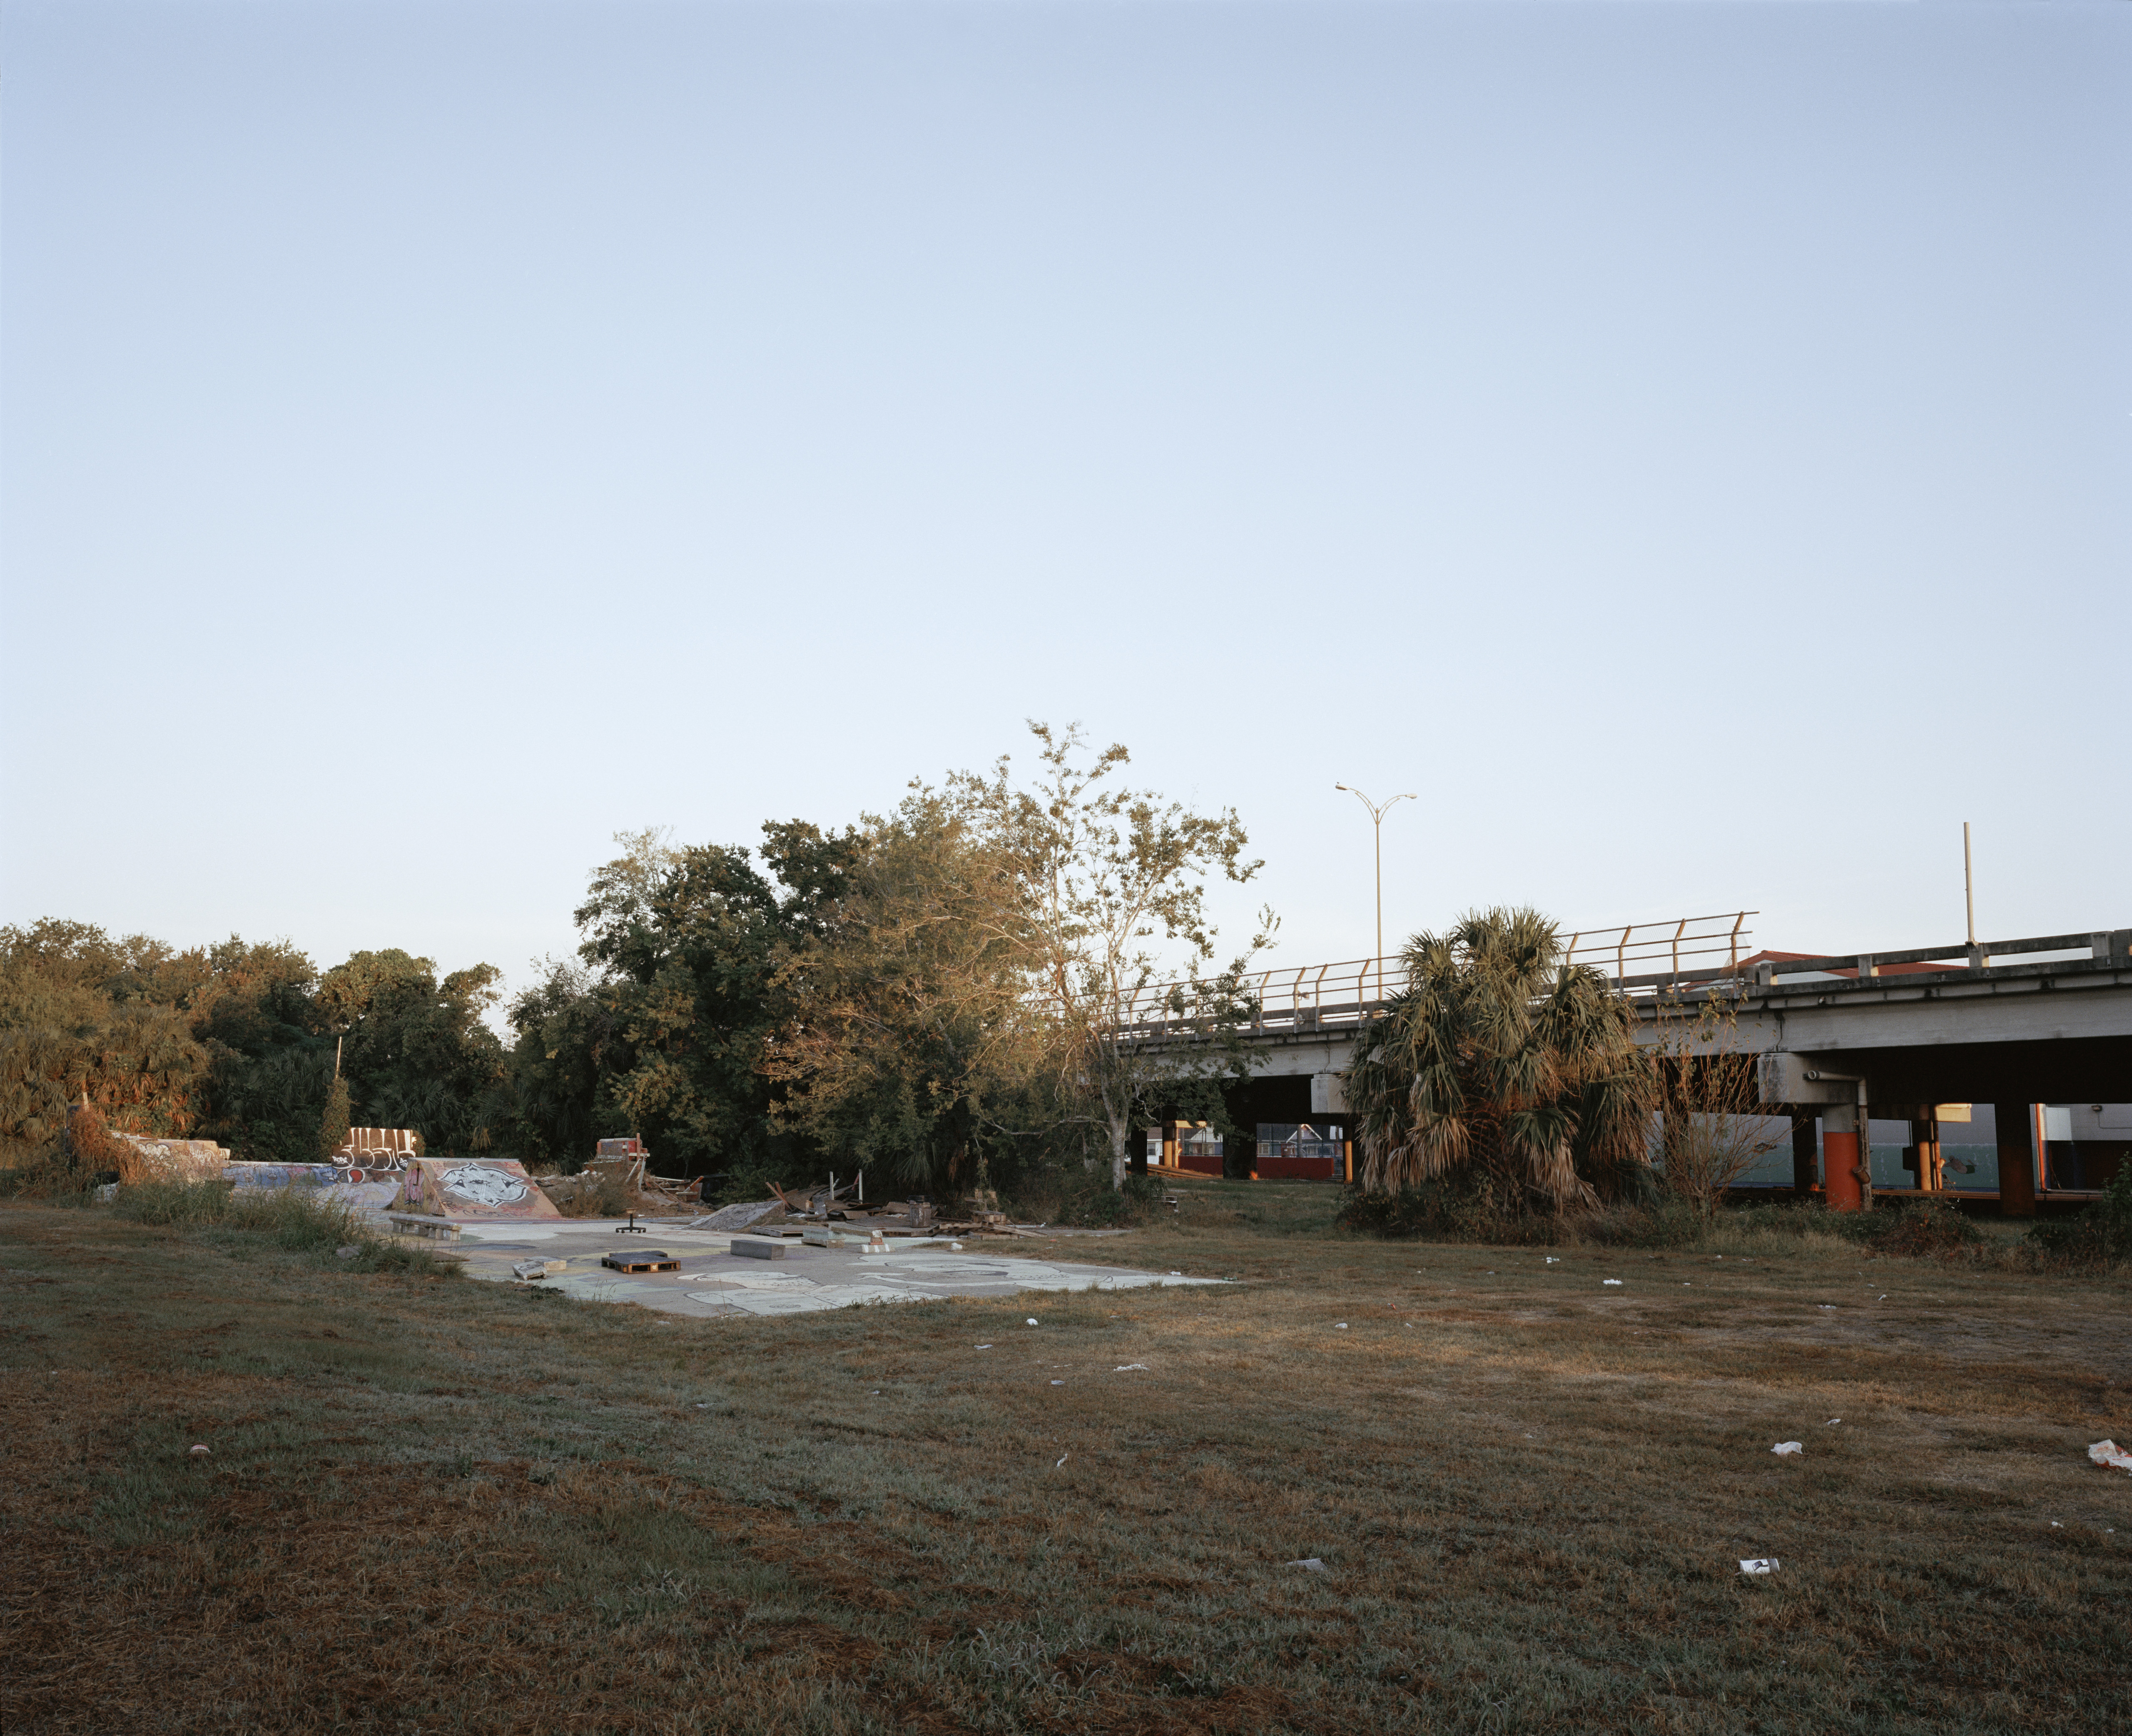 The Peach Orchard, New Orleans, LA, USA